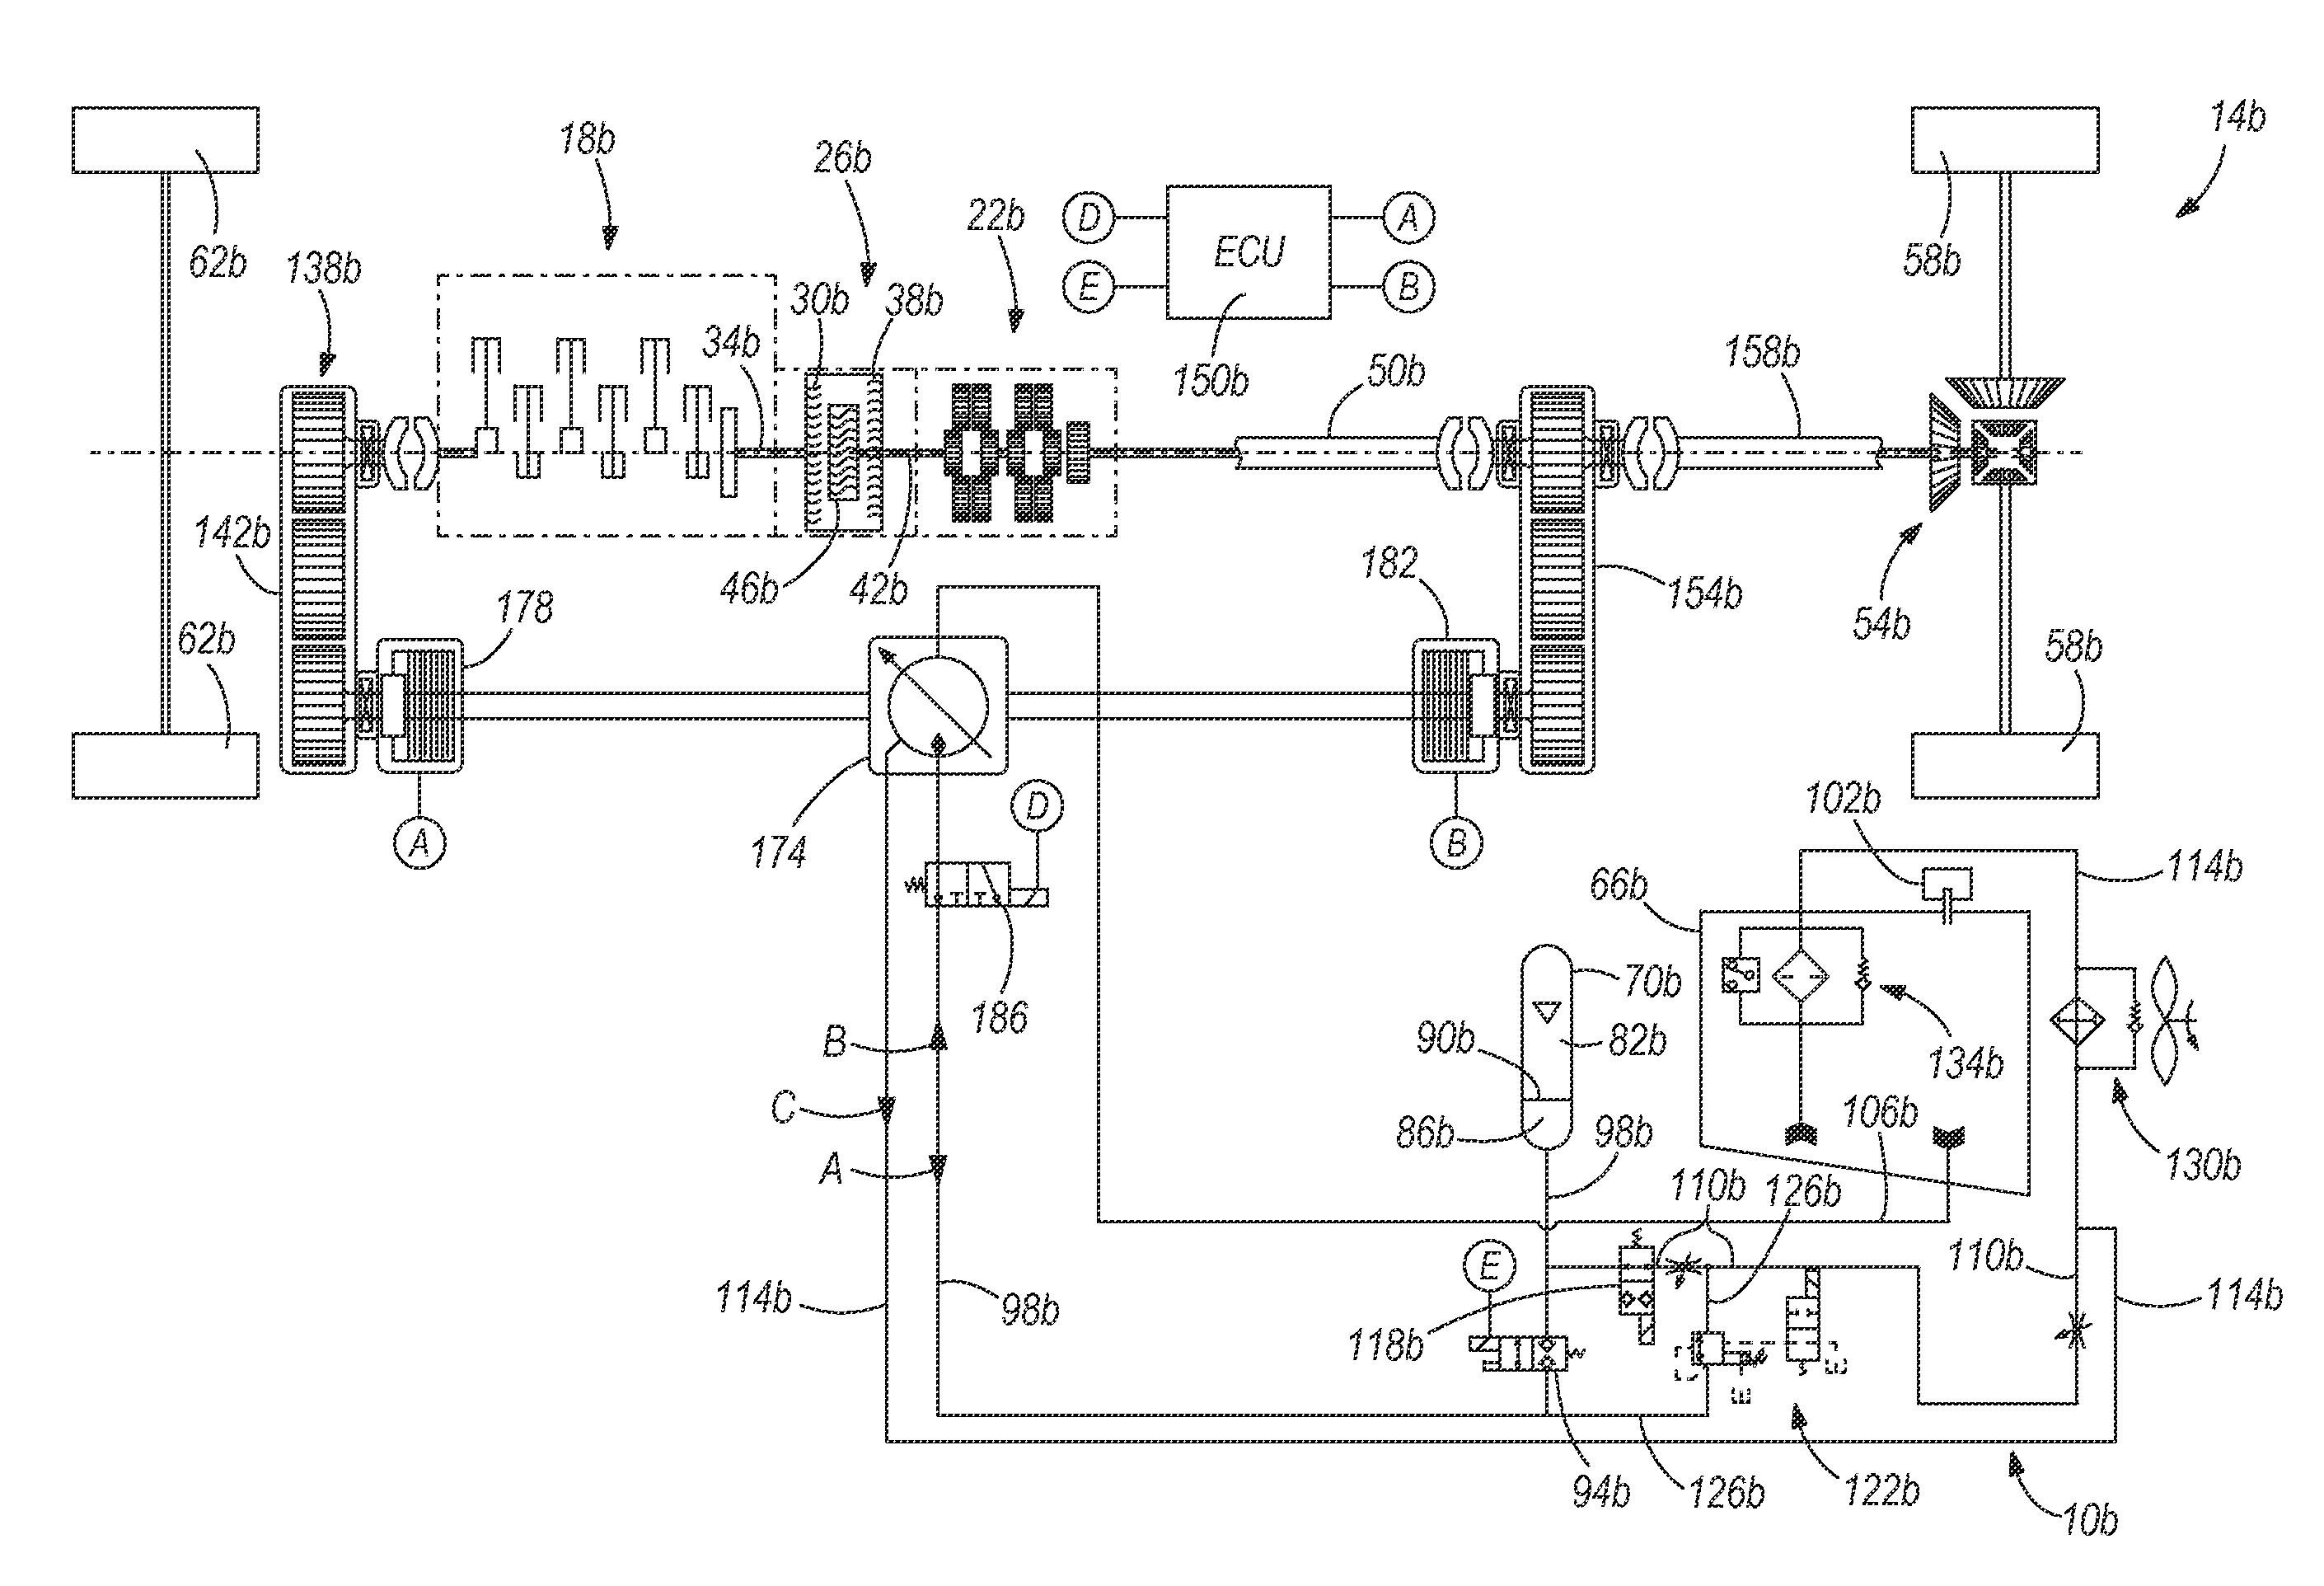 Farmall 706 Wiring Diagram from schematron.org